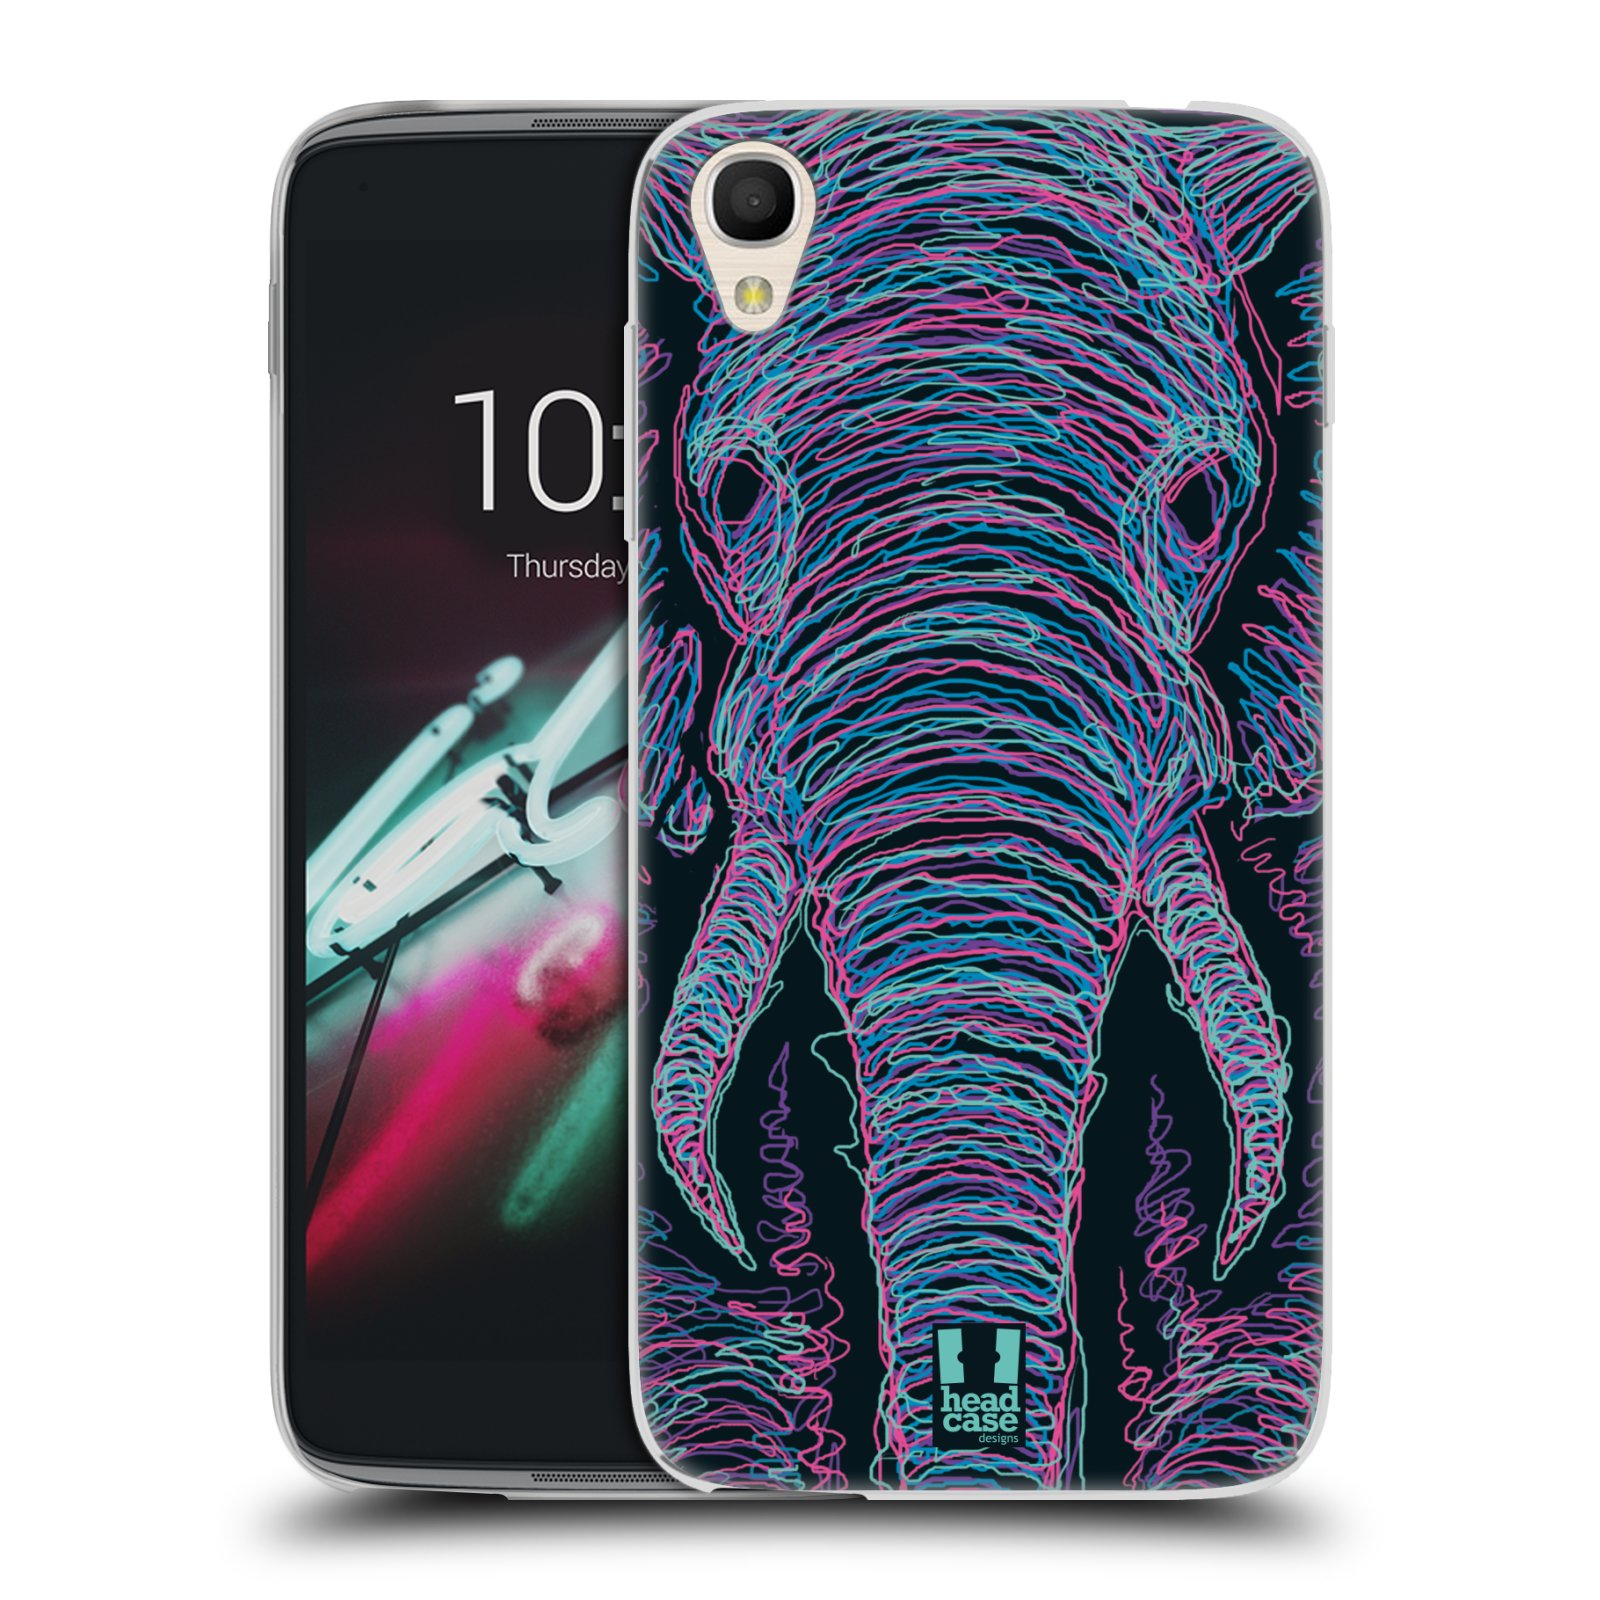 HEAD CASE silikonový obal na mobil Alcatel Idol 3 OT-6039Y (4.7) vzor zvíře čmáranice slon